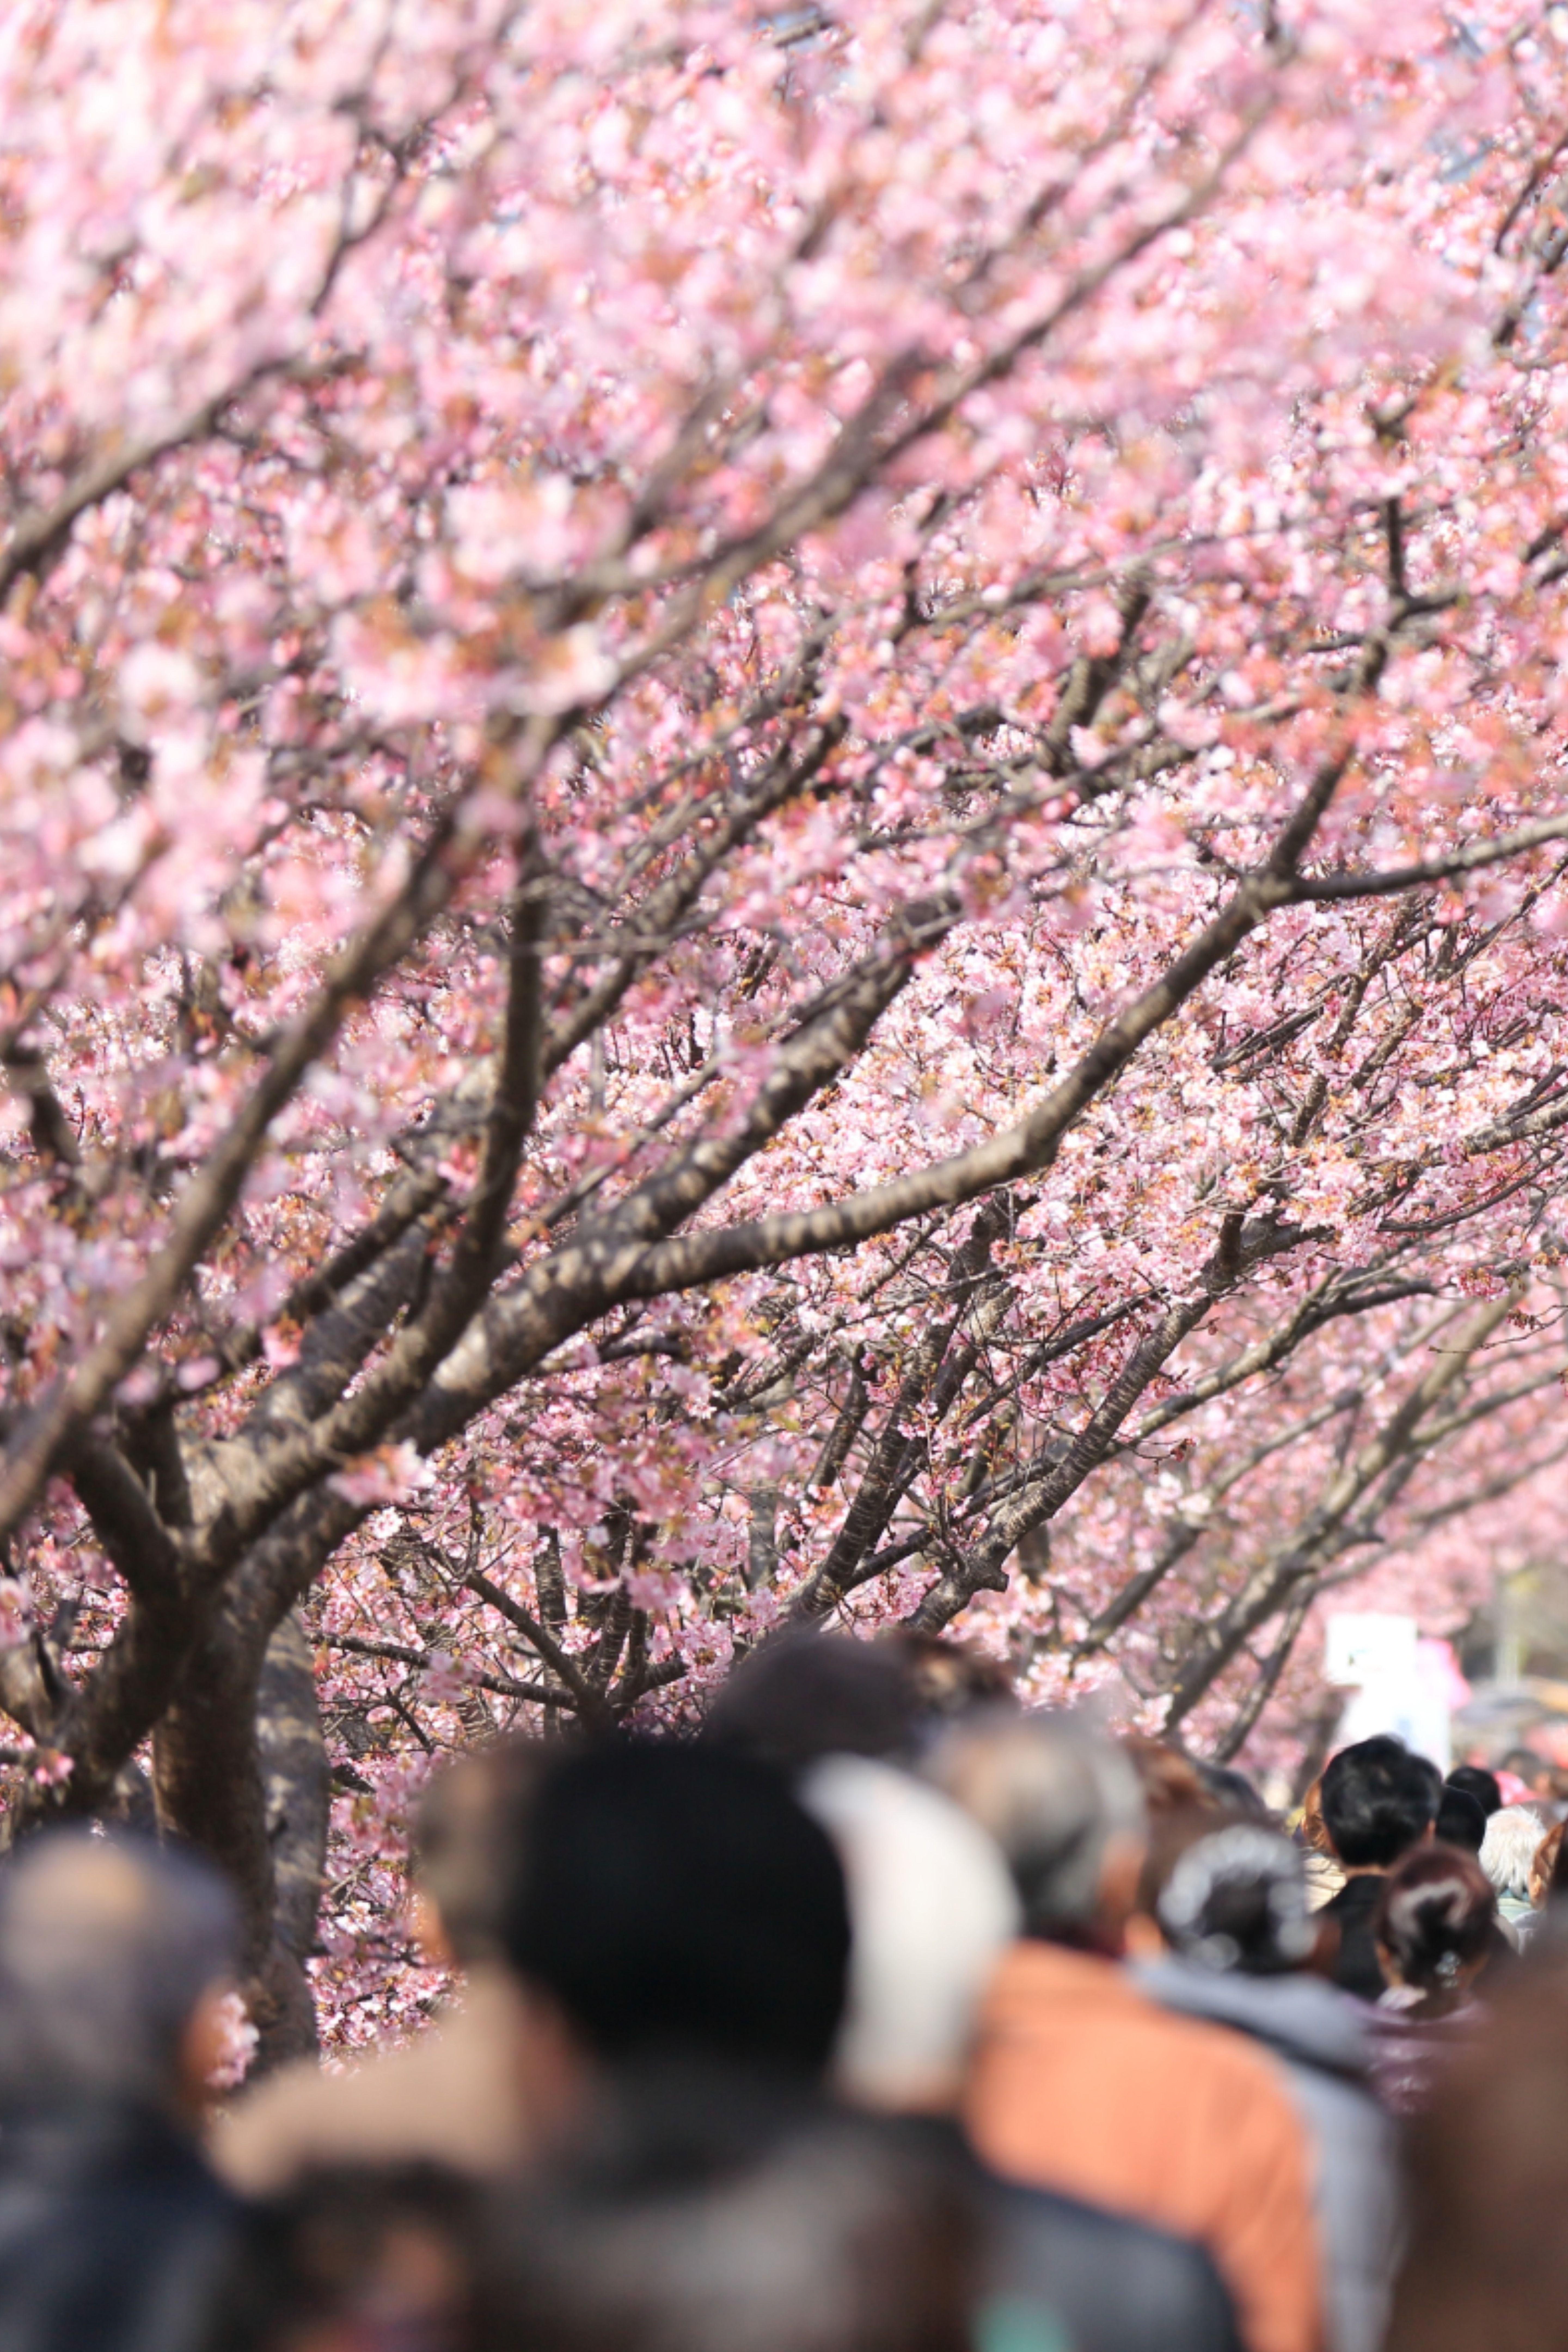 Hanami Cherry Blossom Festival In Japan Cherry Blossom Japan Japan Cherry Blossom Festival Japan Travel